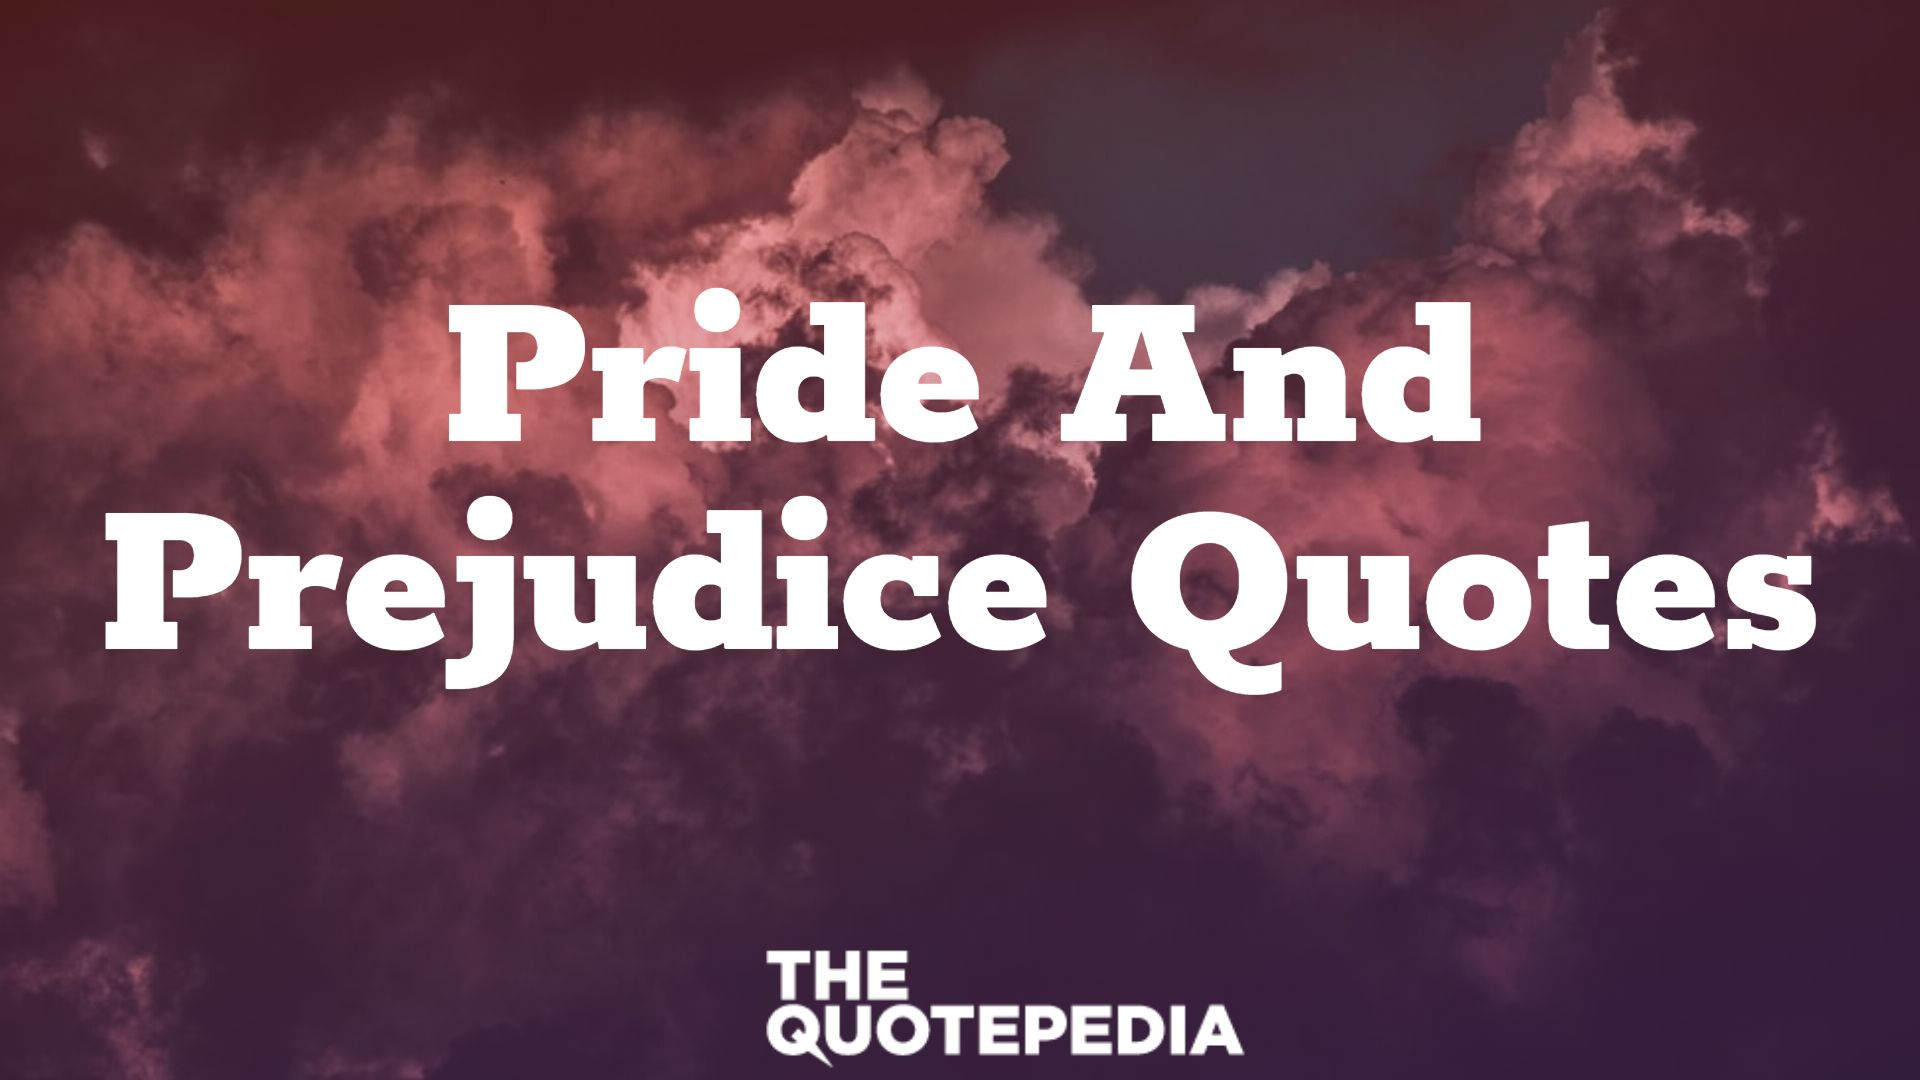 Pride And Prejudice Quotes